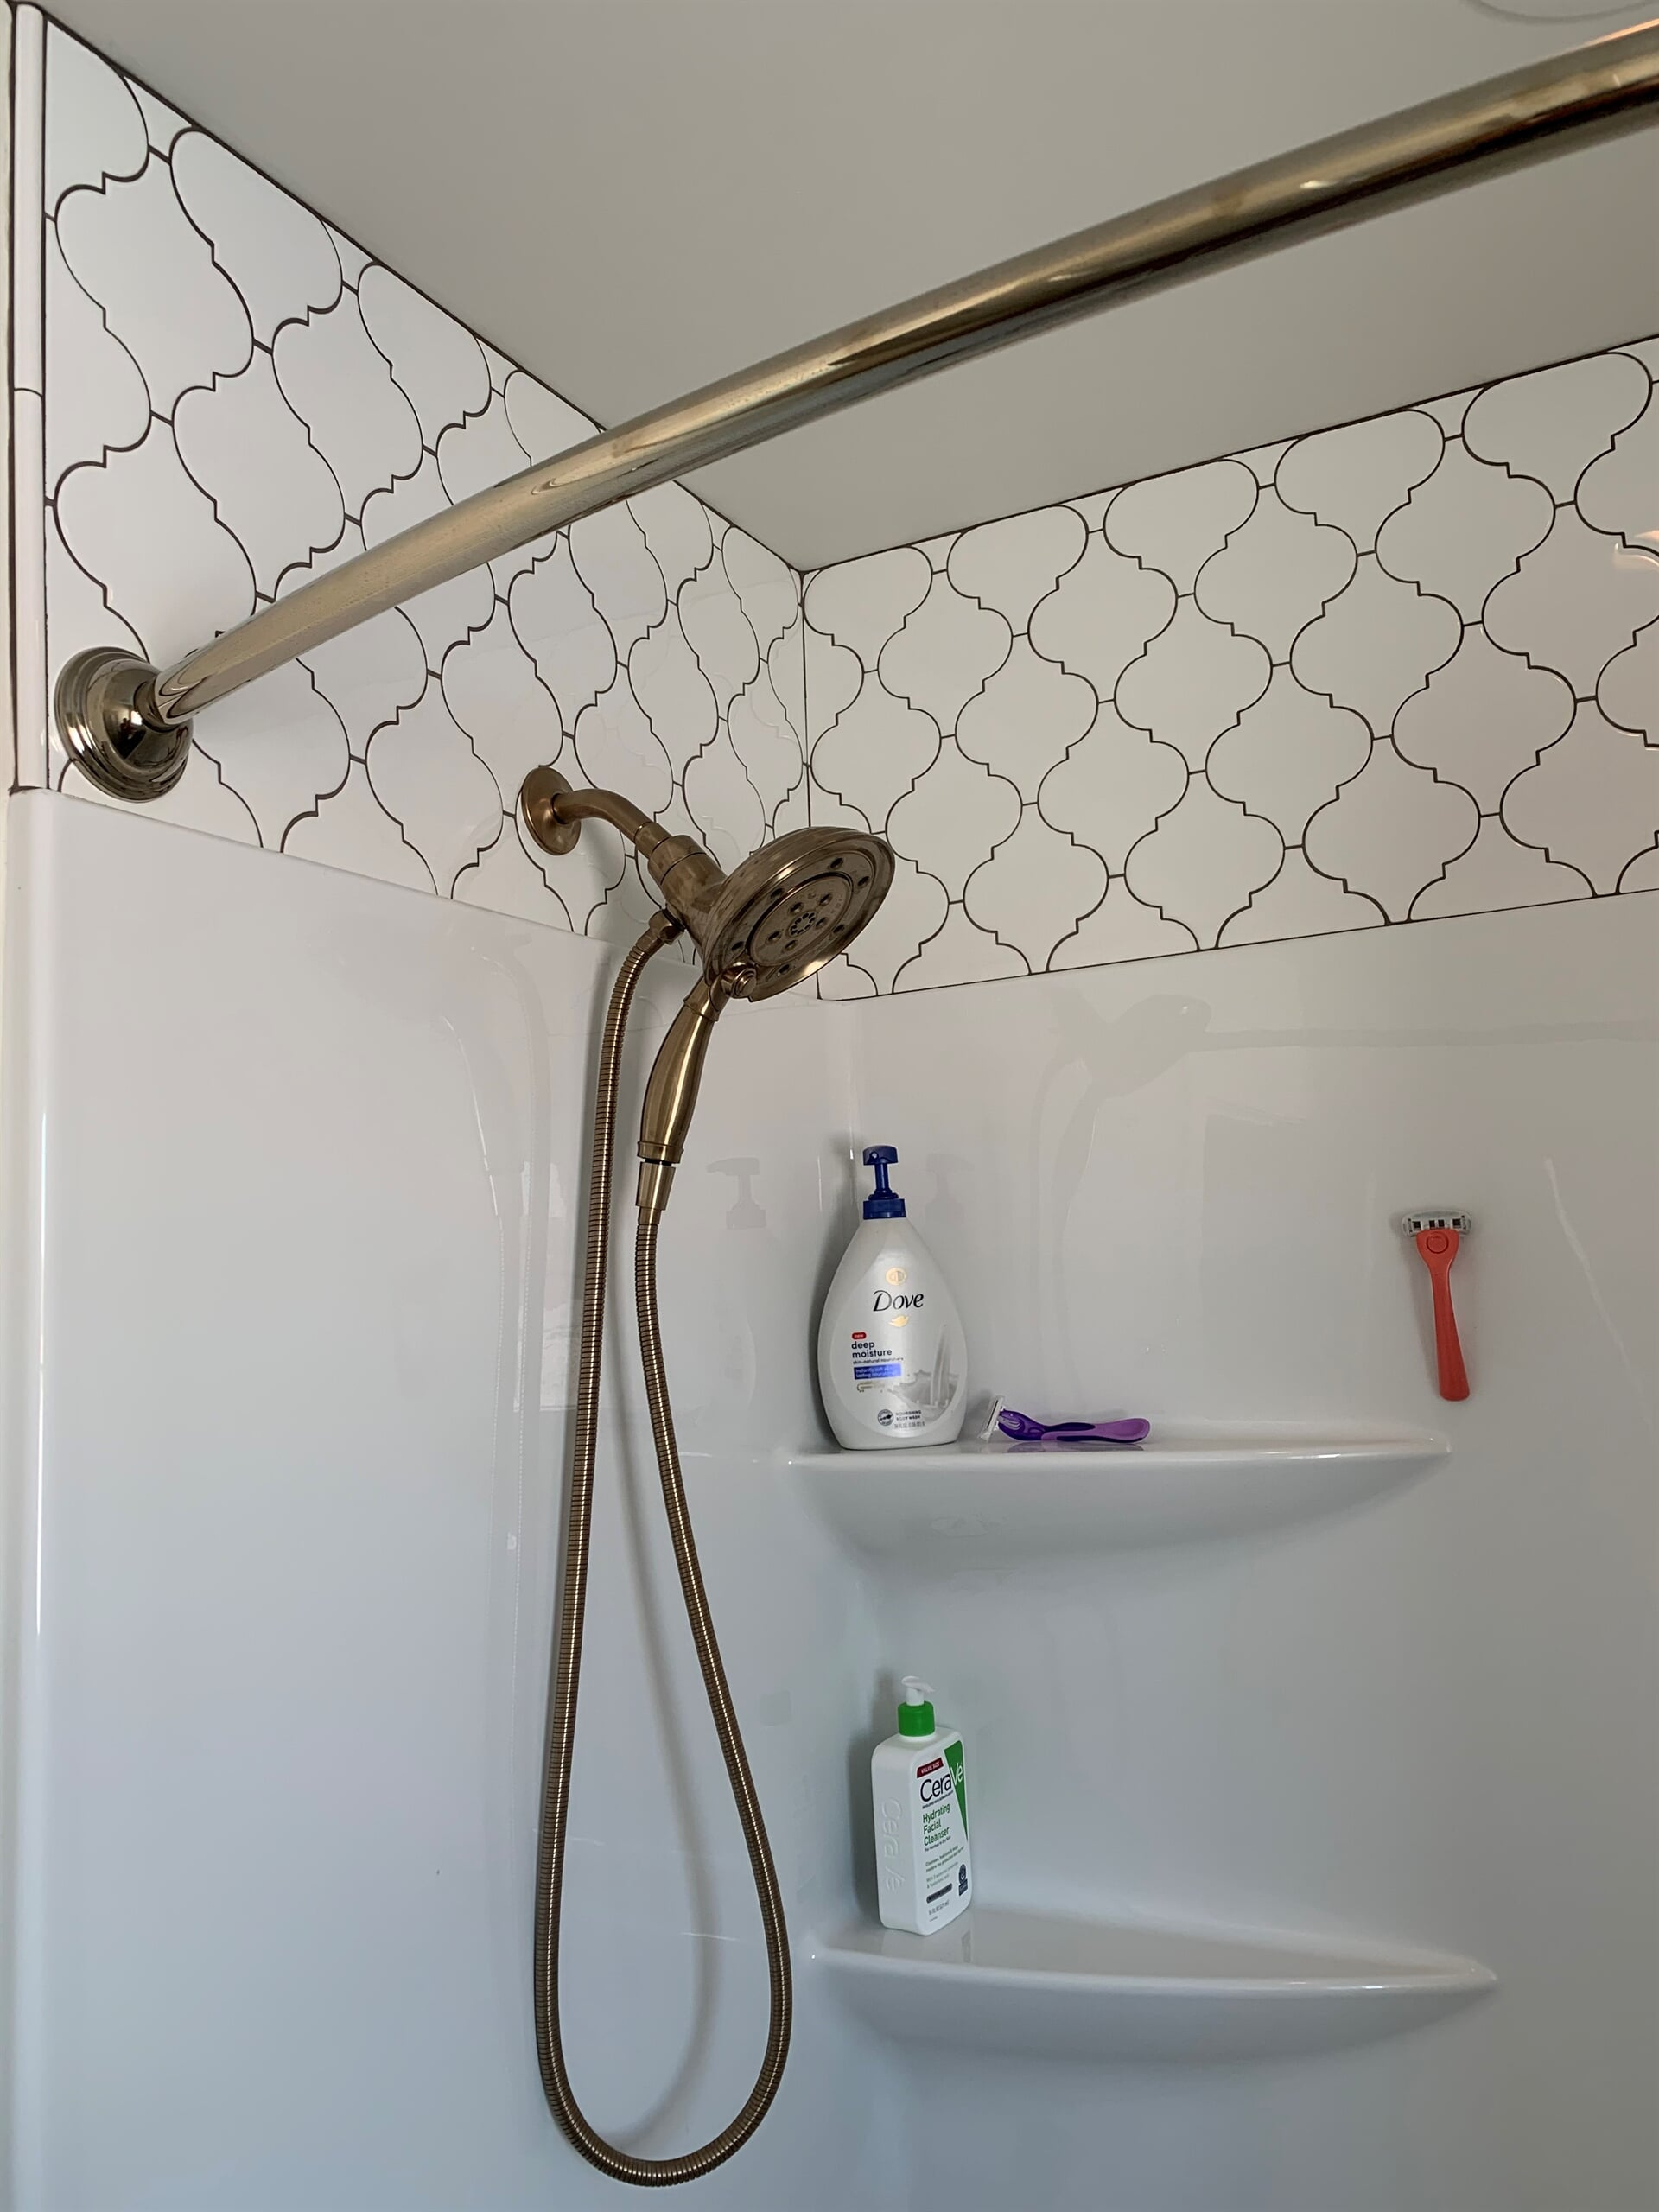 Shower Surround Tile to Ceiling in Grandville, MI from Village Custom Interiors